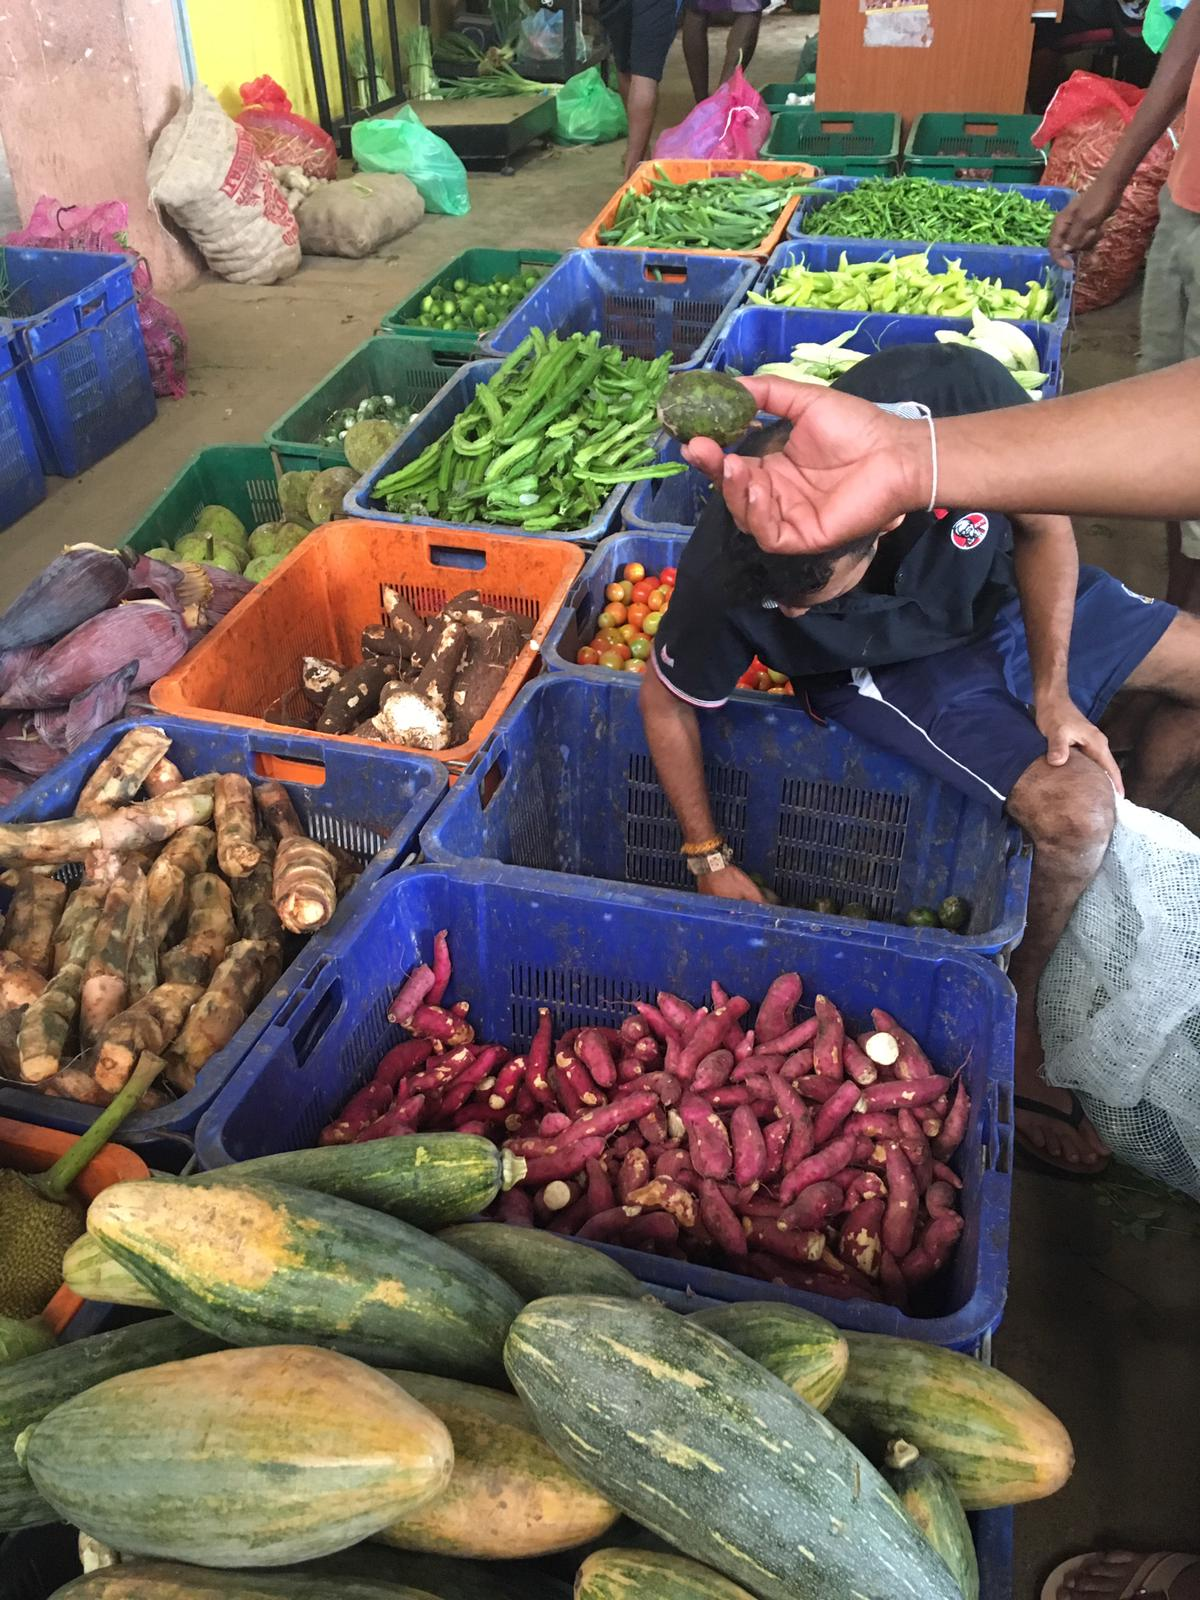 invite-to-paradise-sri-lanka-family-holiday-specialists-customer-feedback-pickering-market-vegetable.jpg